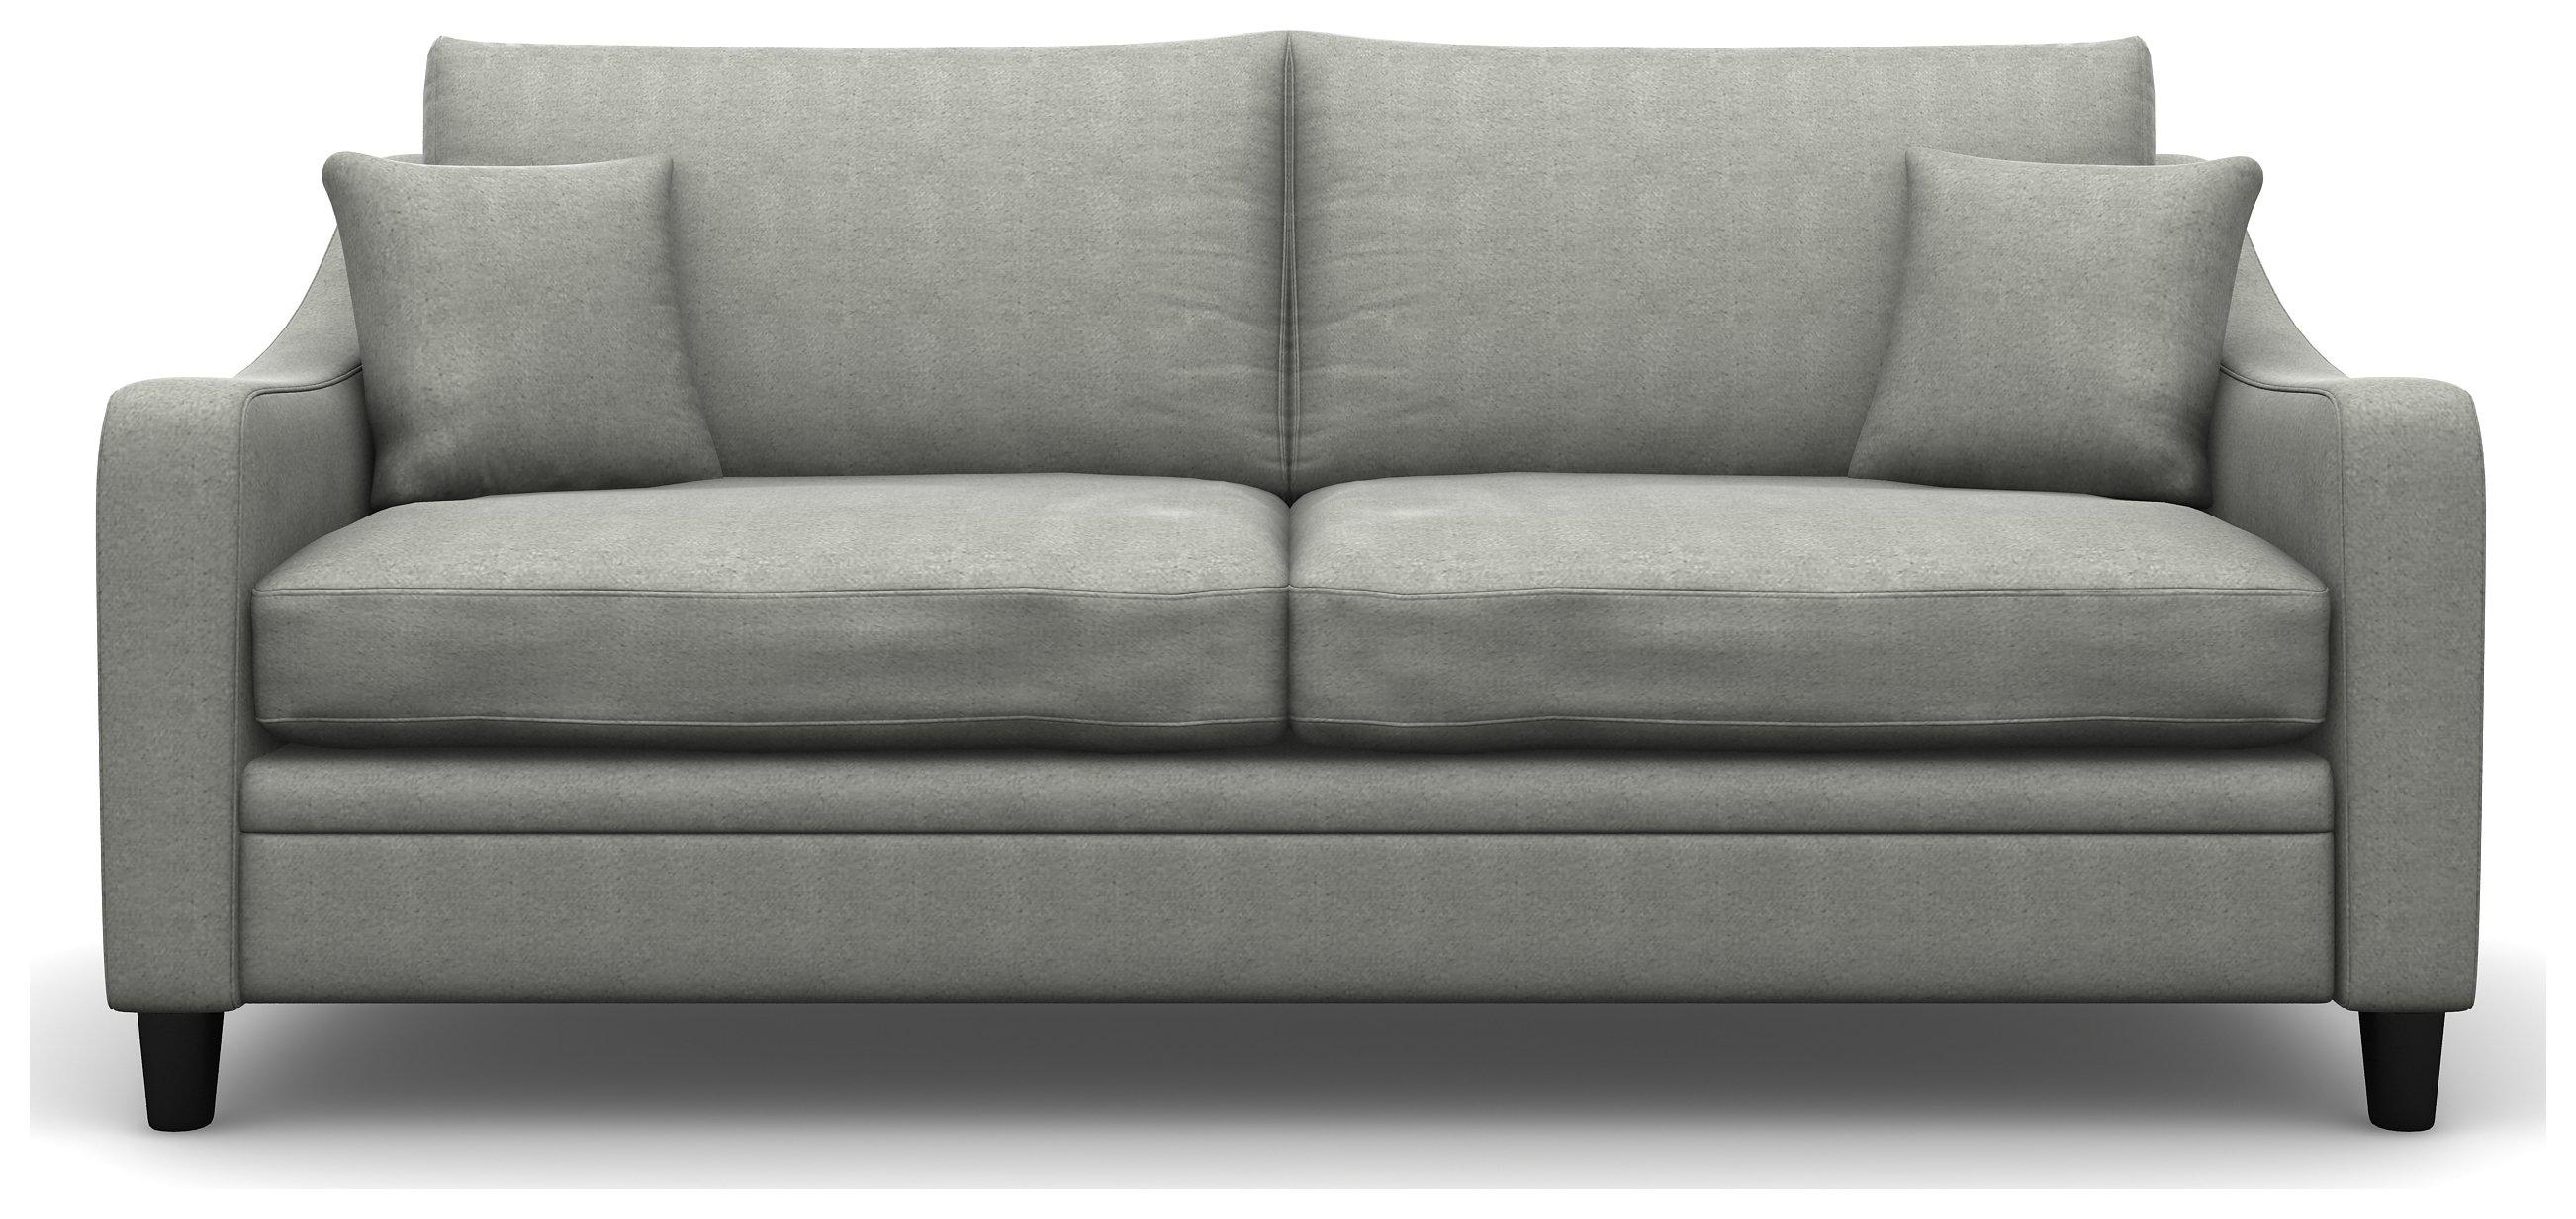 Heart of House Newbury 3 Seater Fabric Sofa - Light Grey + Black Legs